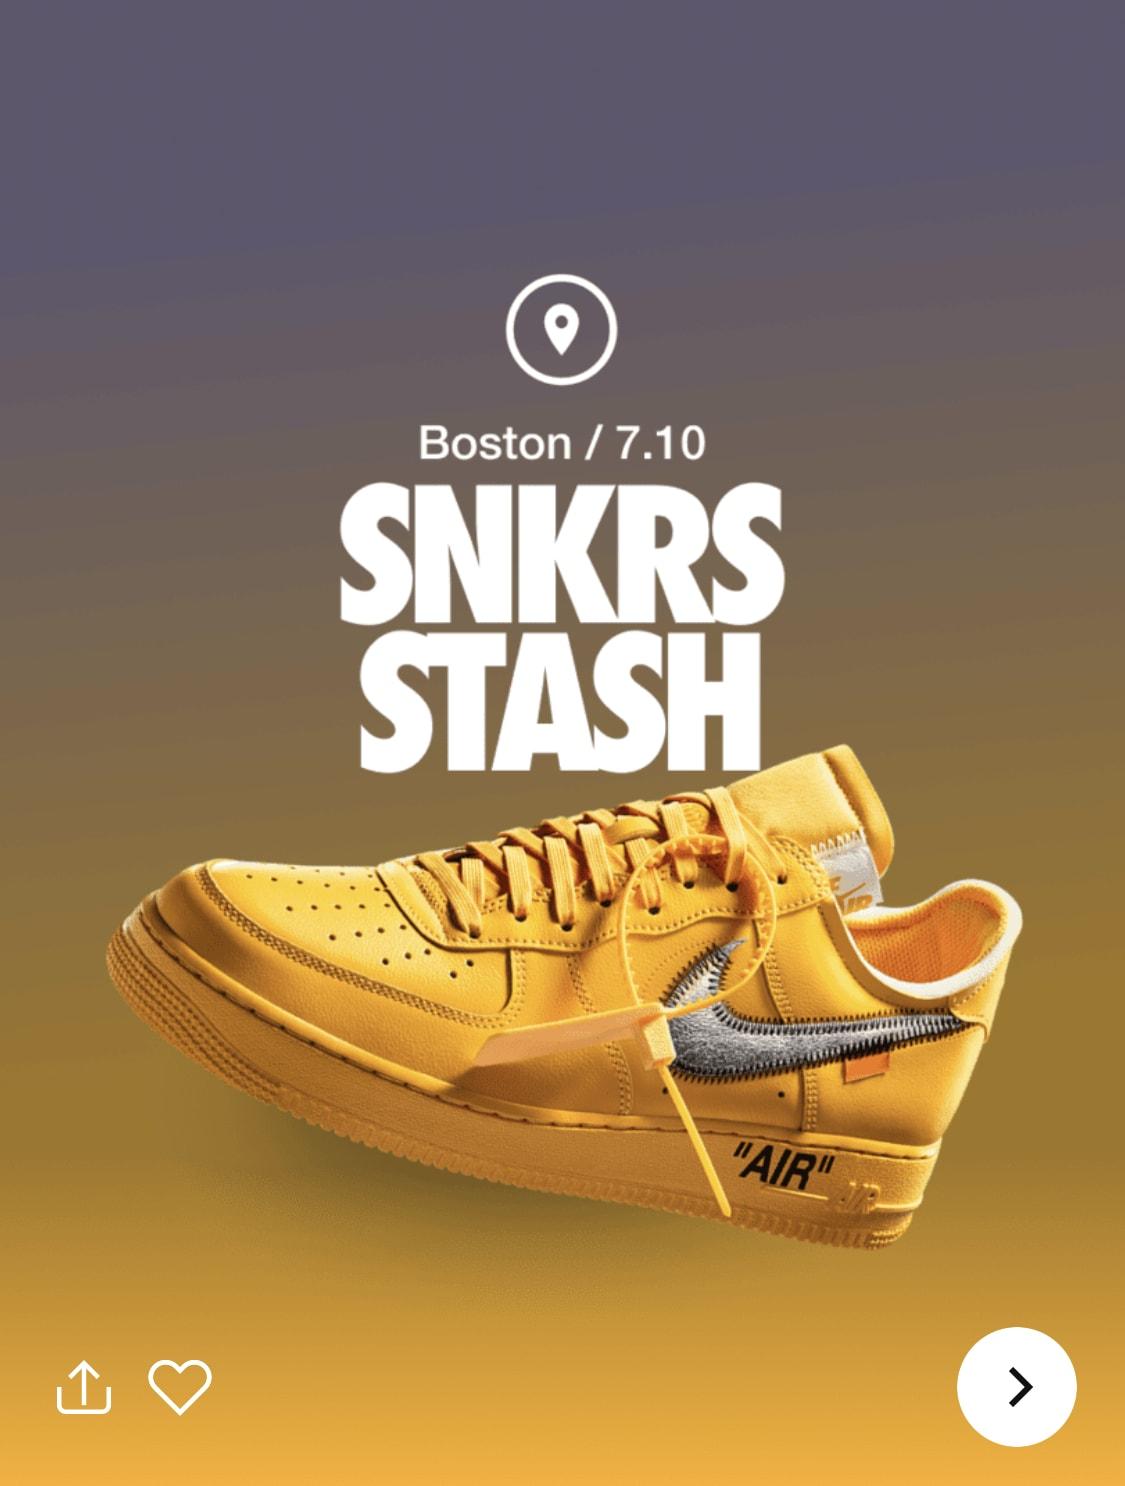 Off-White x Nike Air Force 1 Low 'Lemonade' DD1876-700 SNKRS Stash